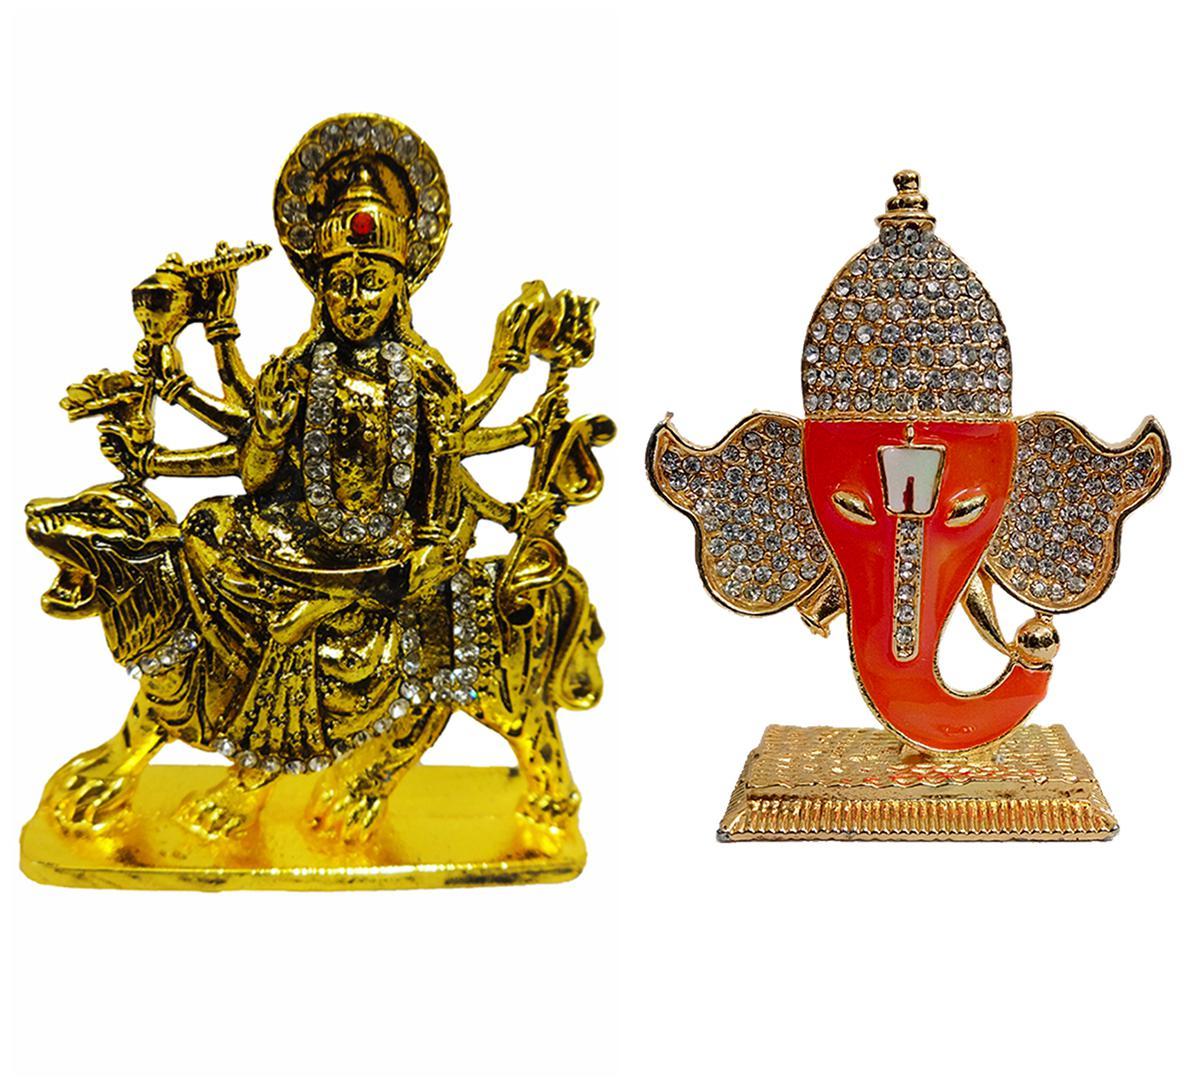 Fabzone Goddess Durga Devi & Ganesha Car Dashboard Idol God Statue Spiritual Puja Vastu Showpiece Figurine-Religious Murti Pooja Gift Item